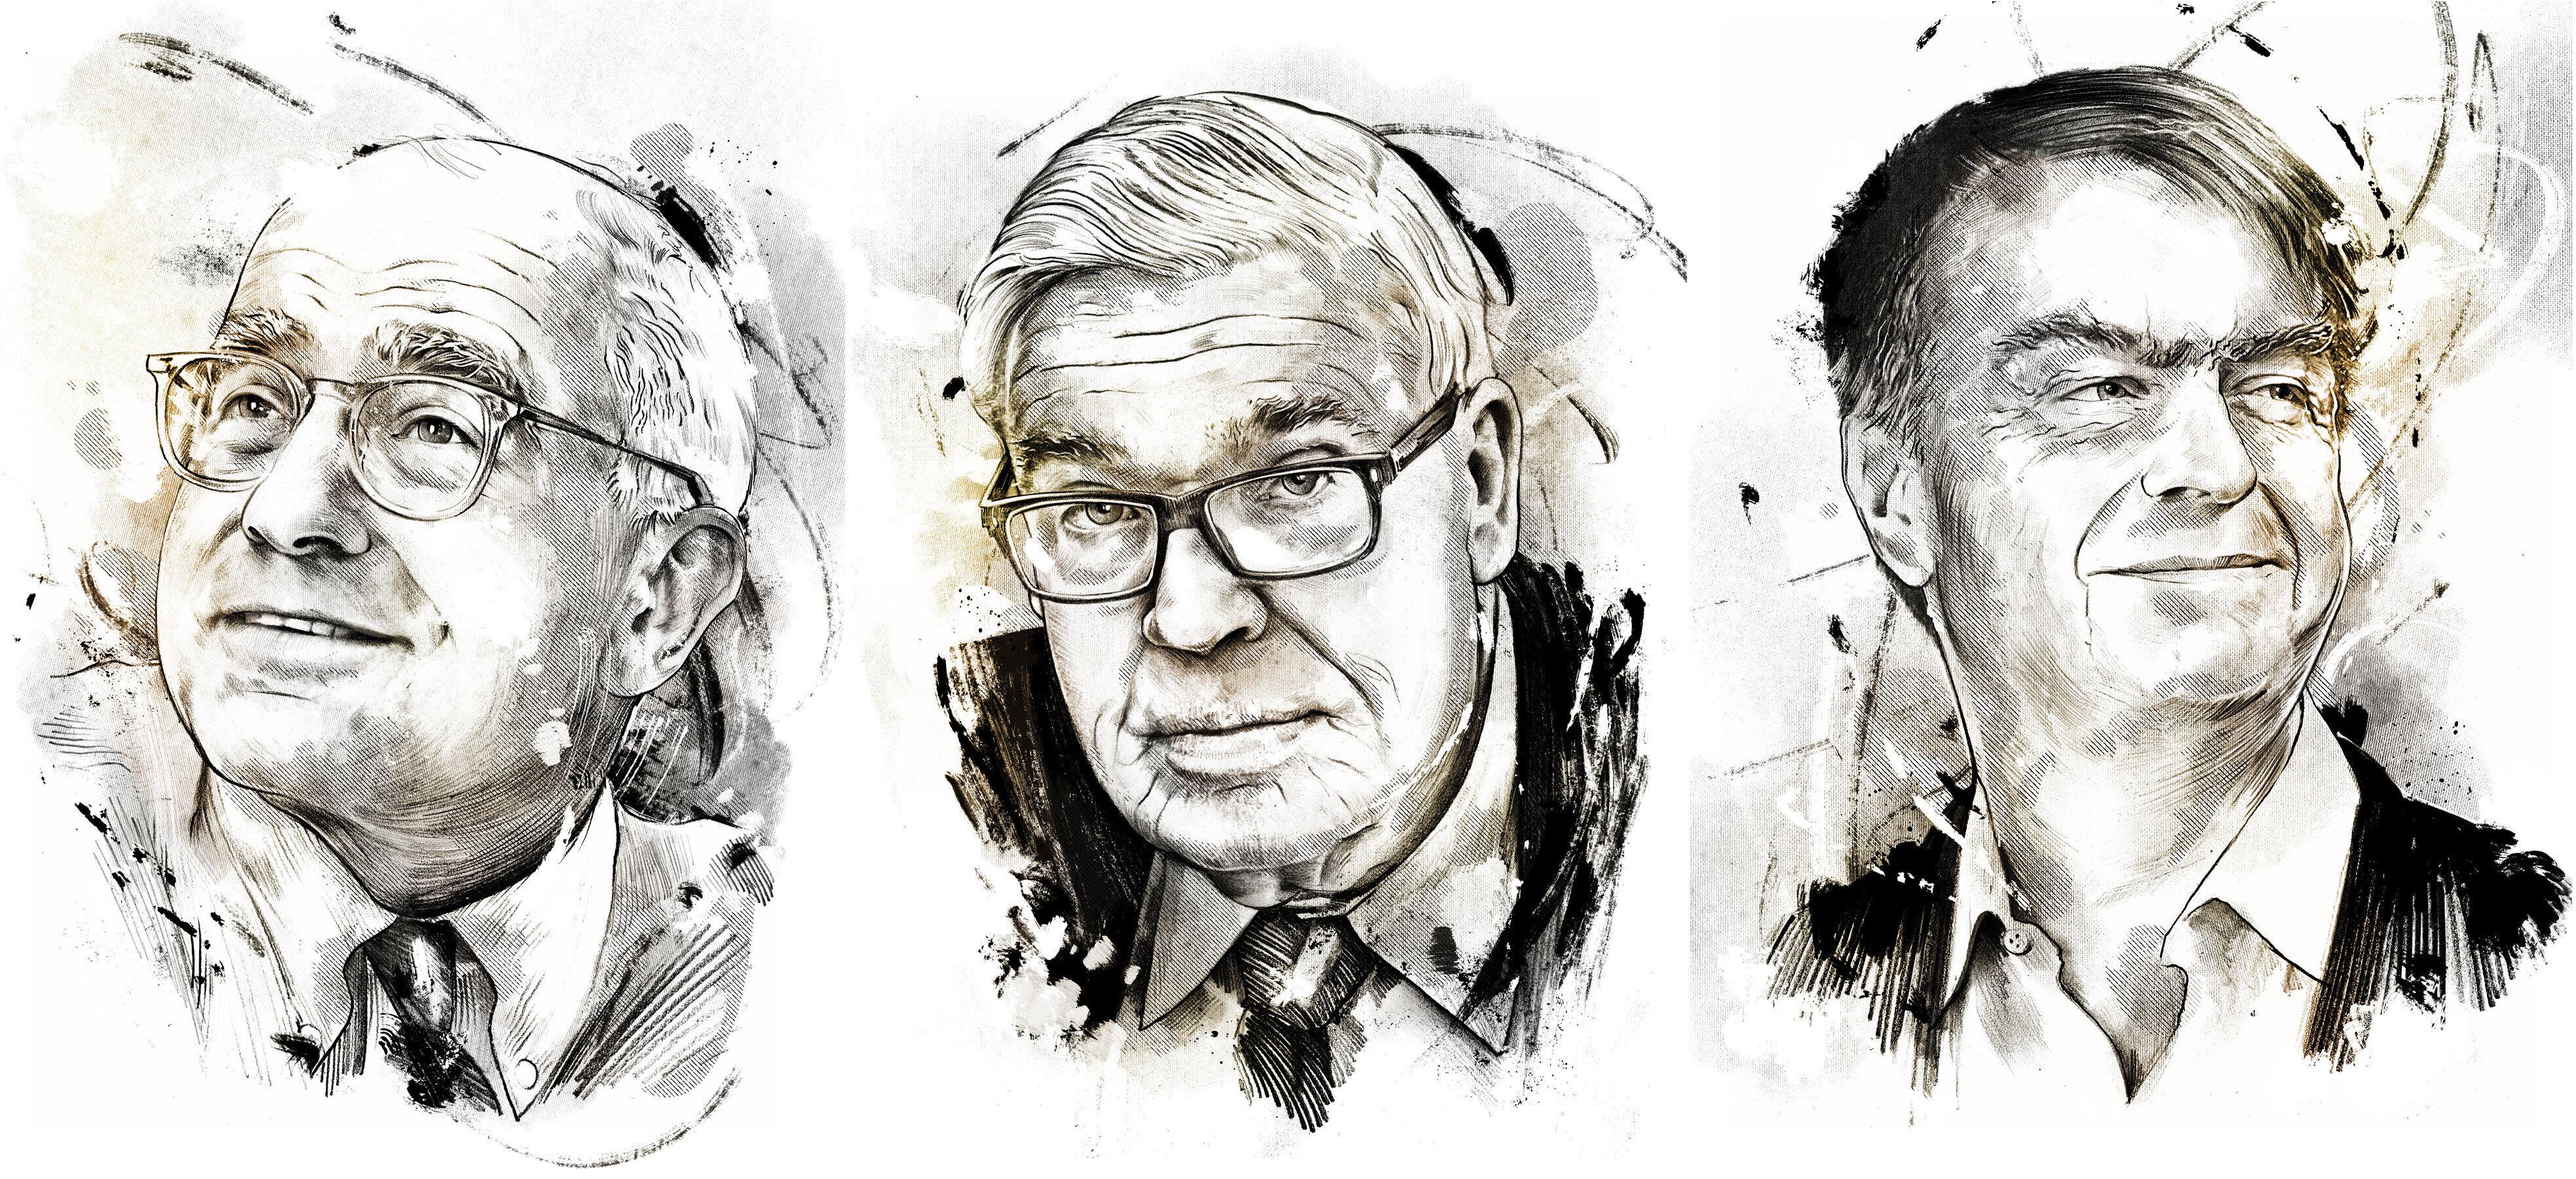 Portraits portrait illustration editorial portraitdrawing 2 - Kornel Illustration   Kornel Stadler portfolio